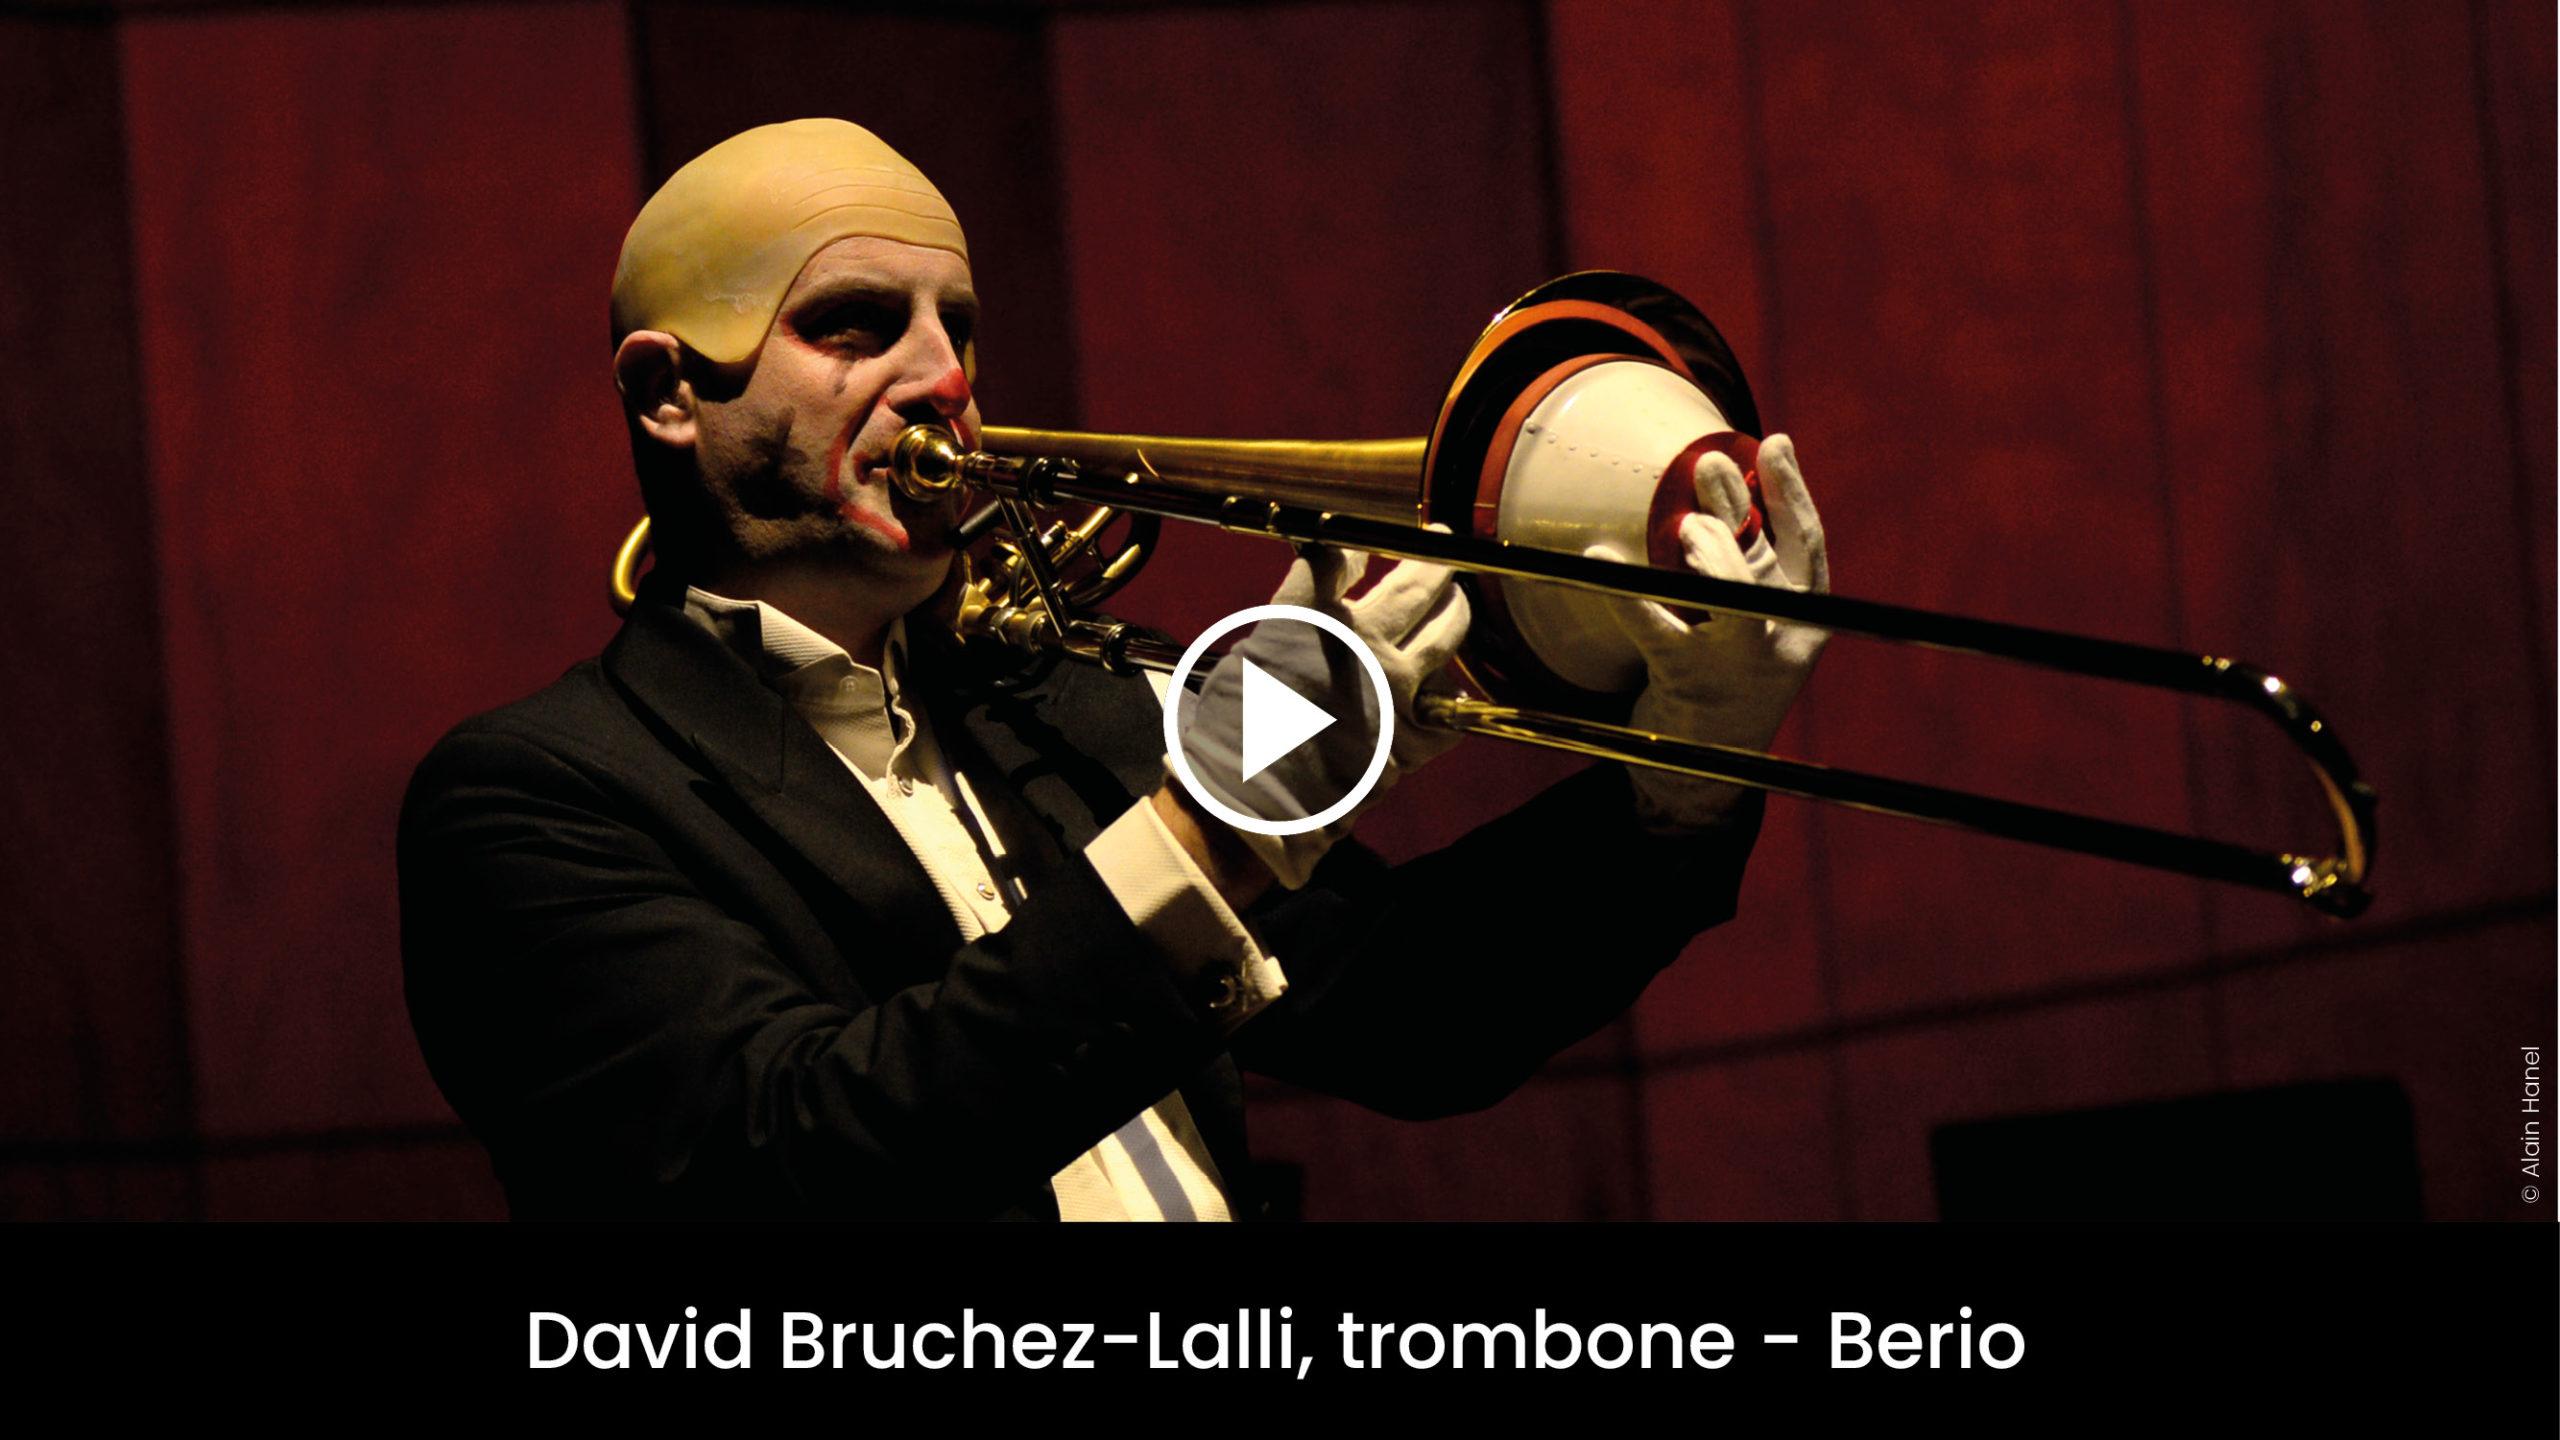 David Bruchez-Lalli, trombone